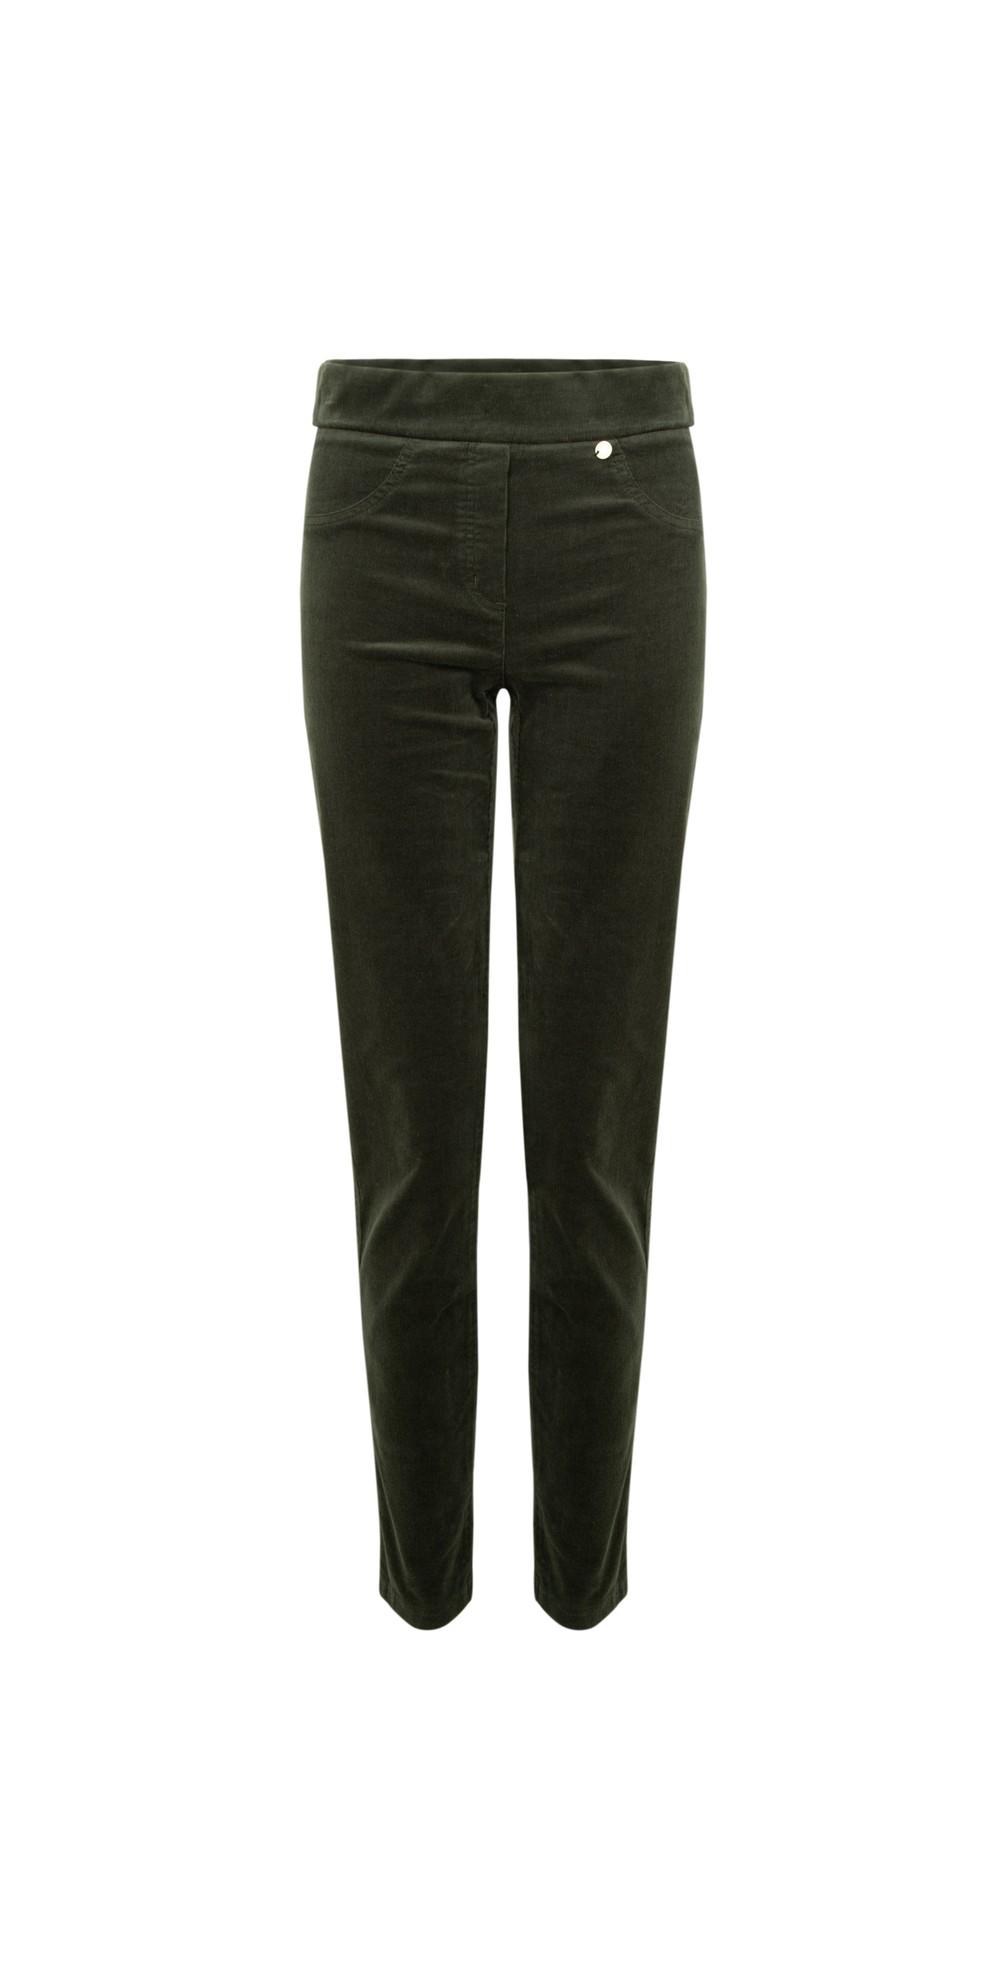 Rose Green NeedleCord Slimfit Trousers main image